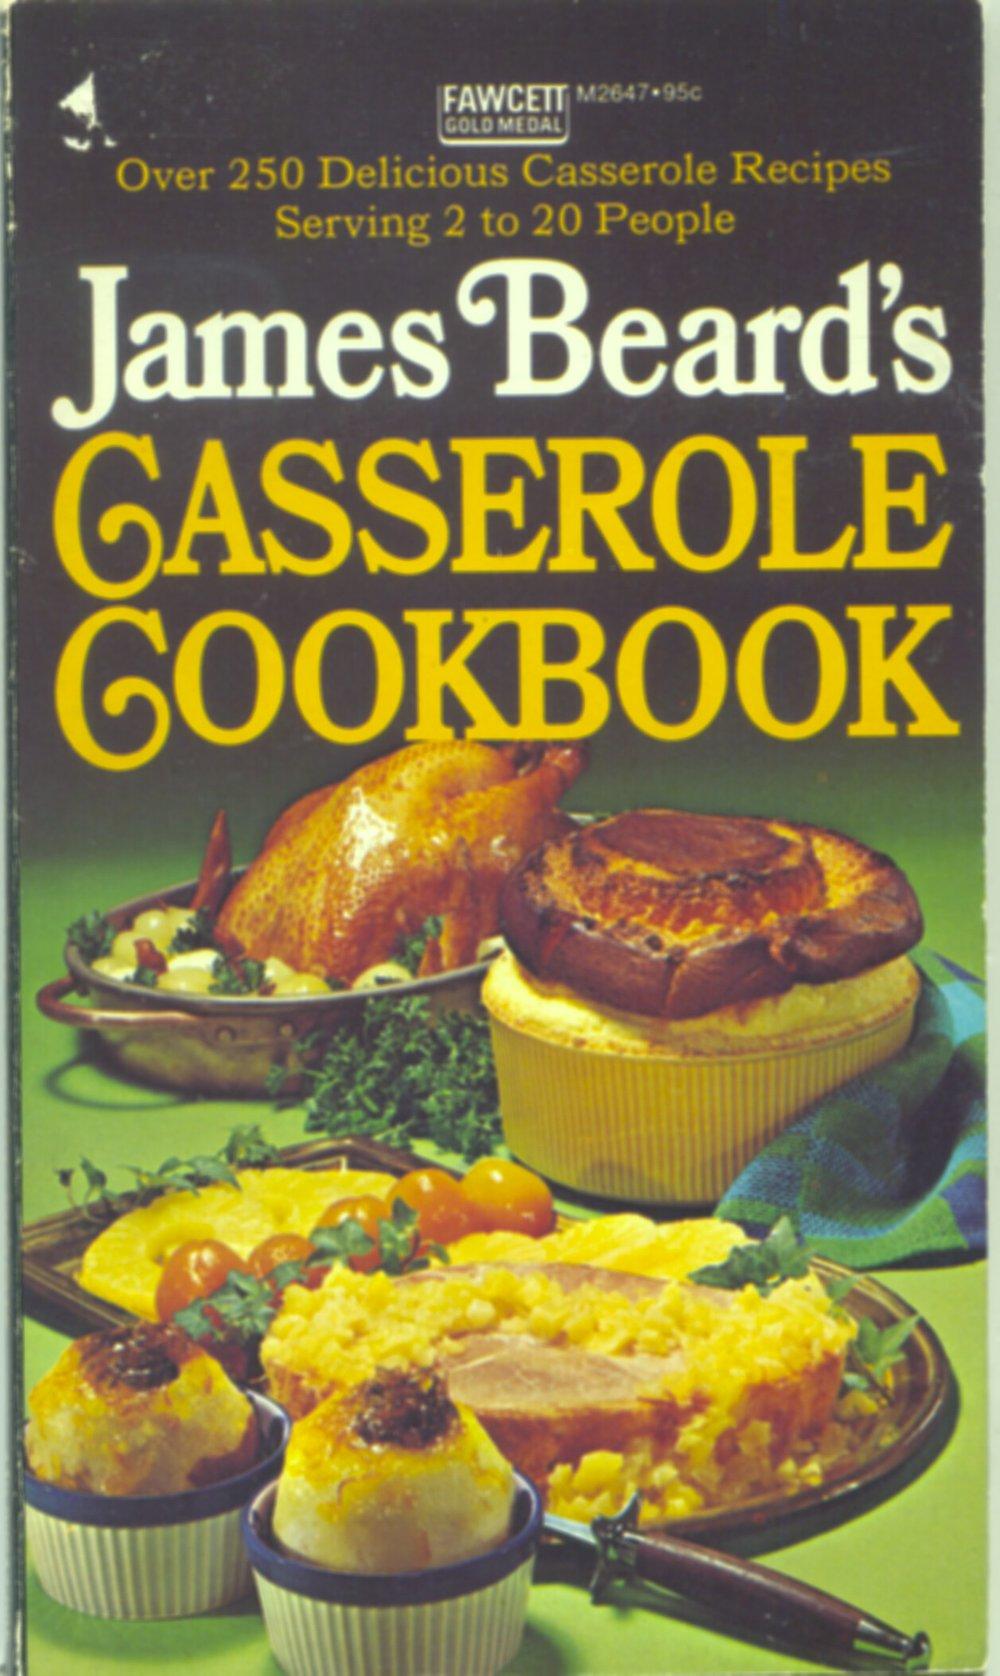 James Beard's Casserole Cookbook, 1955 ... mine is a paperback 1972, printing